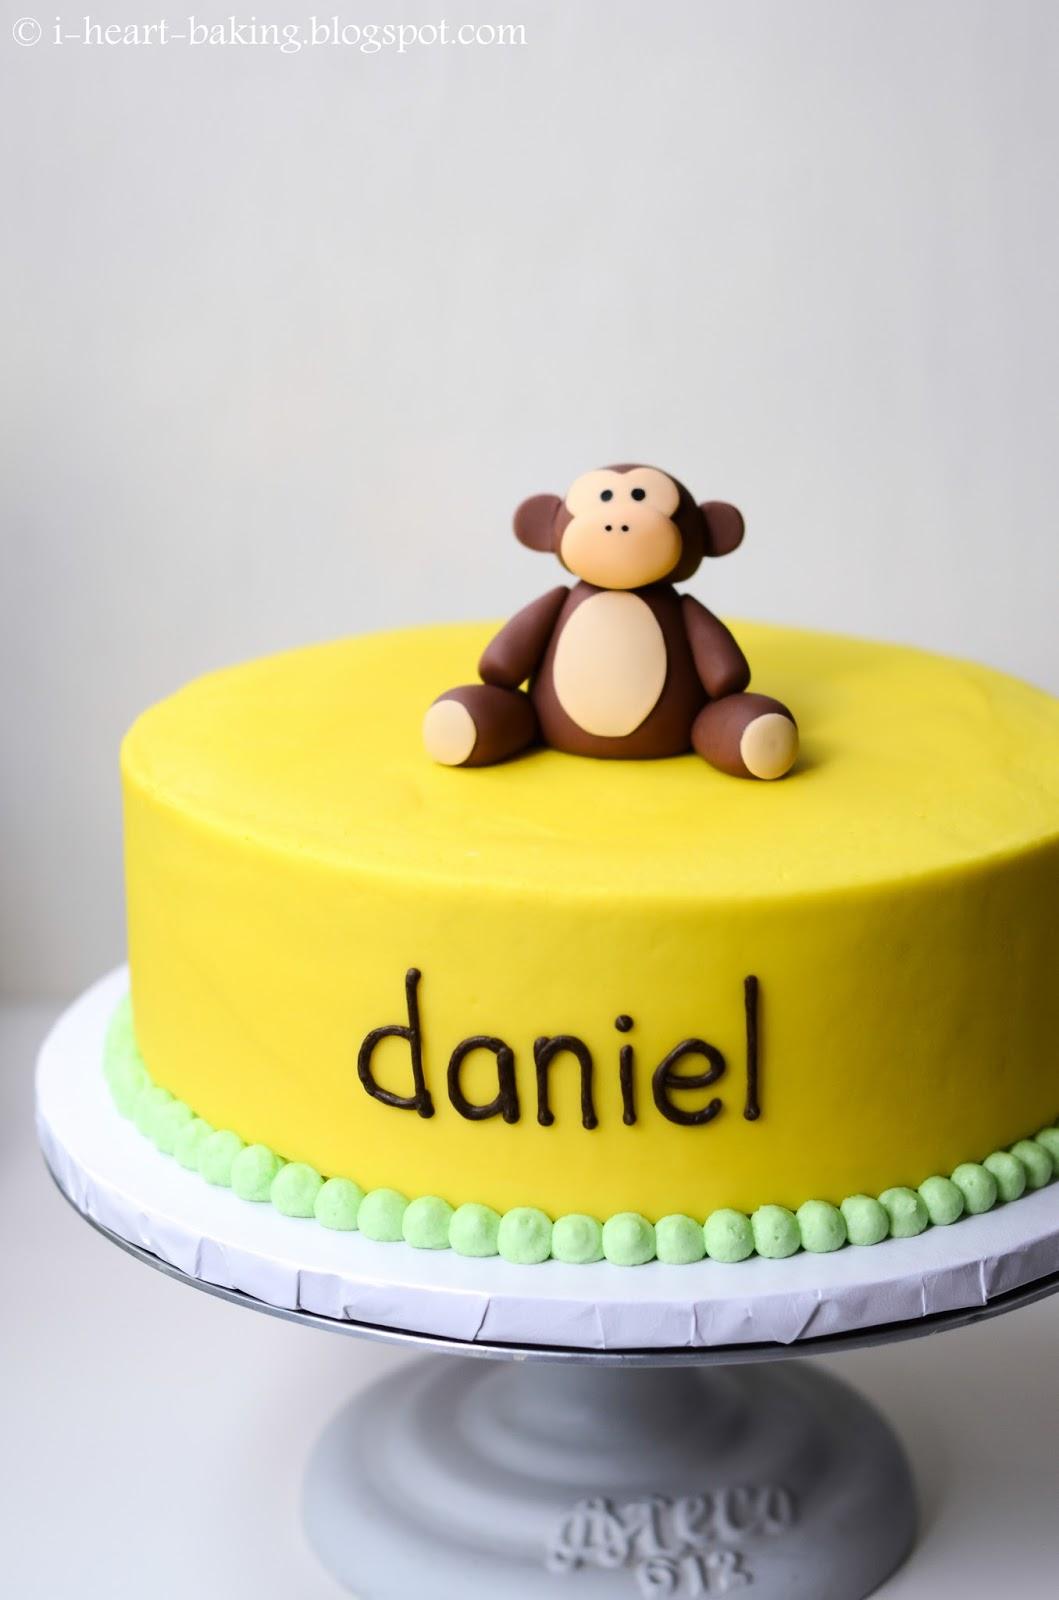 ... !: banana cream birthday cake with handmade fondant monkey topper